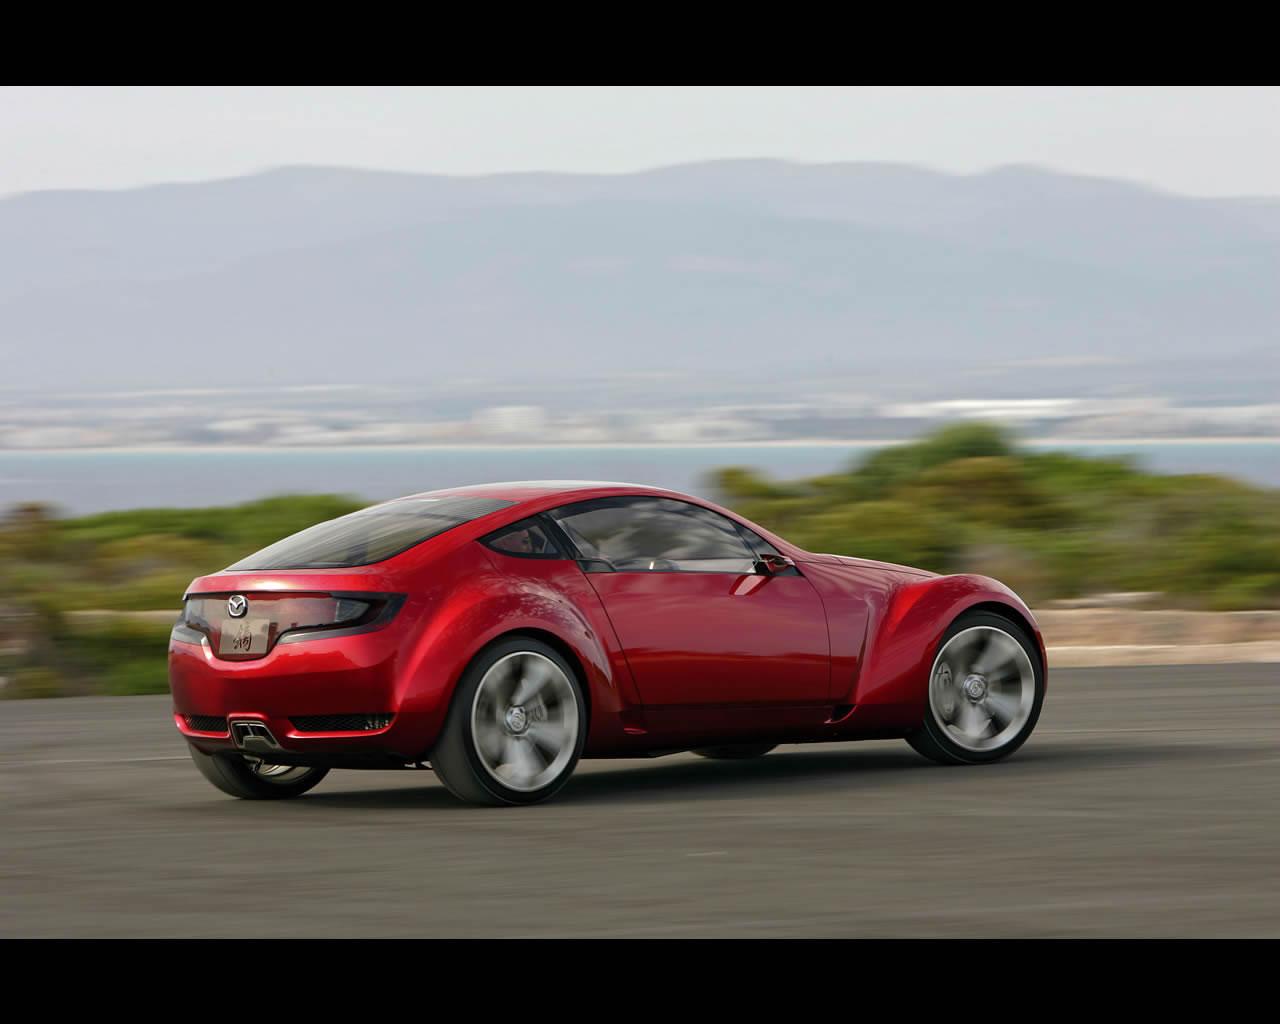 http://www.autoconcept-reviews.com/cars_reviews/mazda/mazda-kabura/wallpaper/Mazda_Kabura_2006_driving01_print.jpg